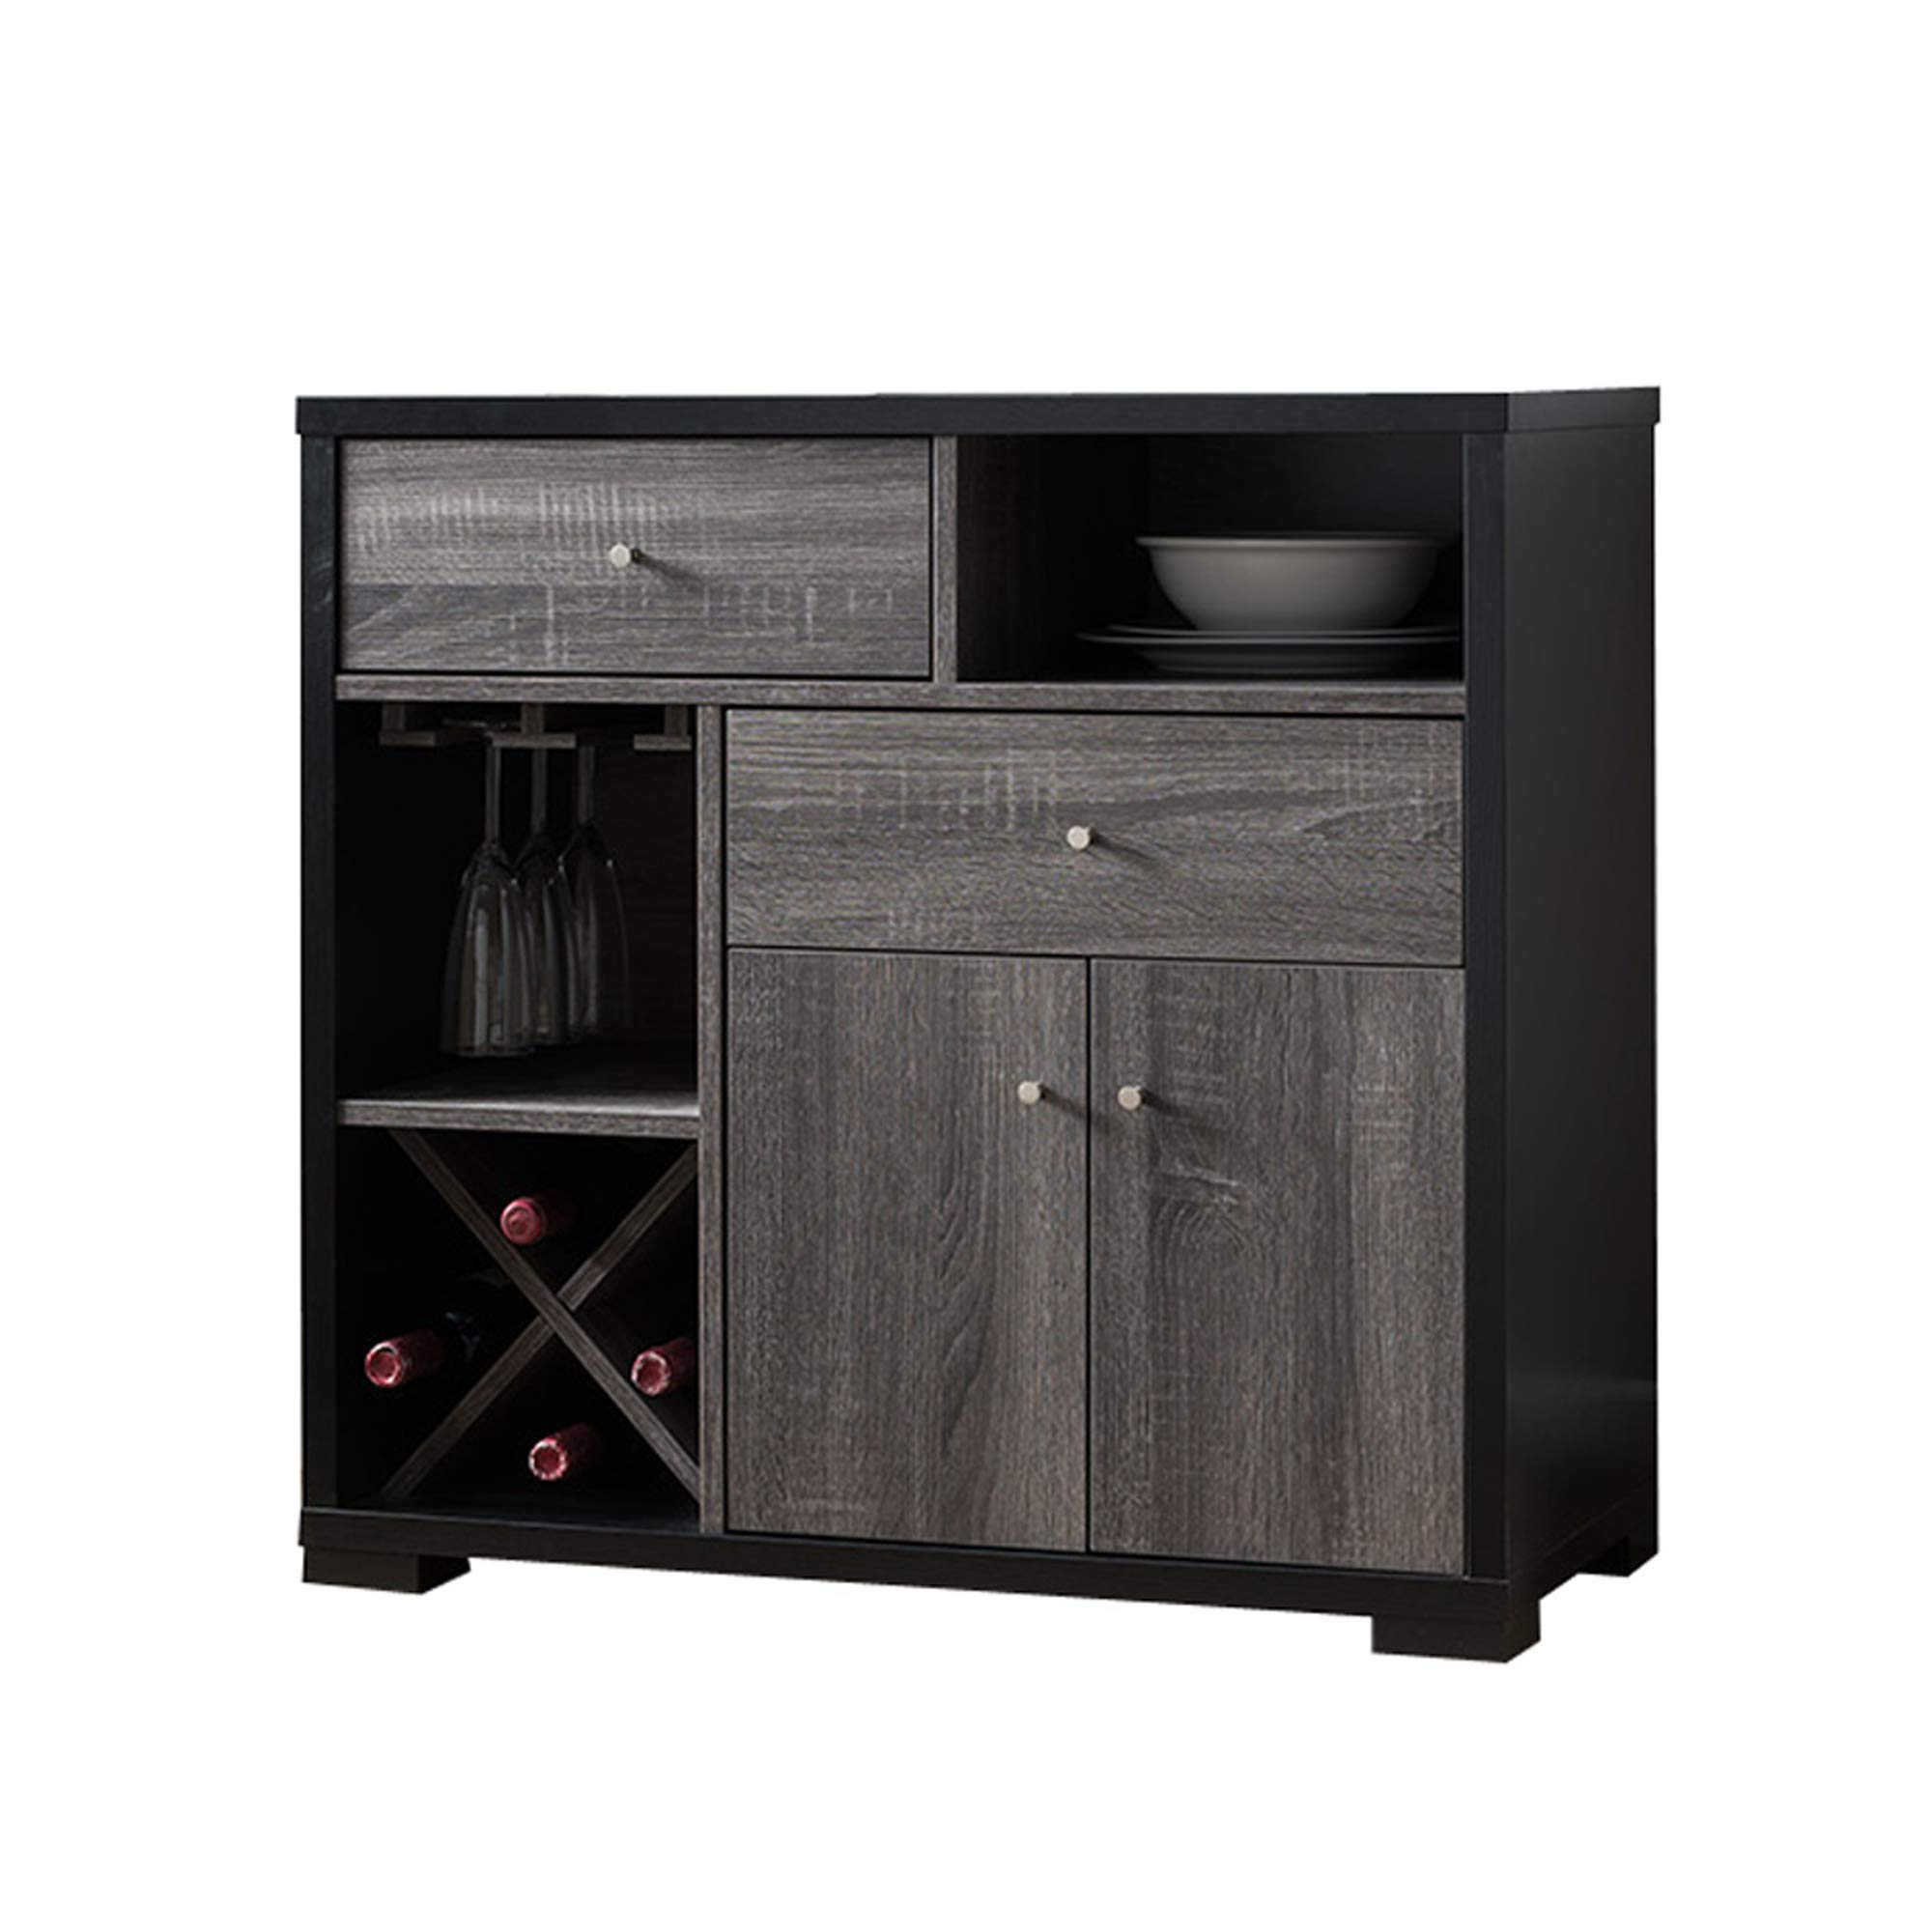 Benjara Benzara BM179615 Dual-Tone Wooden Wine Cabinet, Black and Gray by Benjara